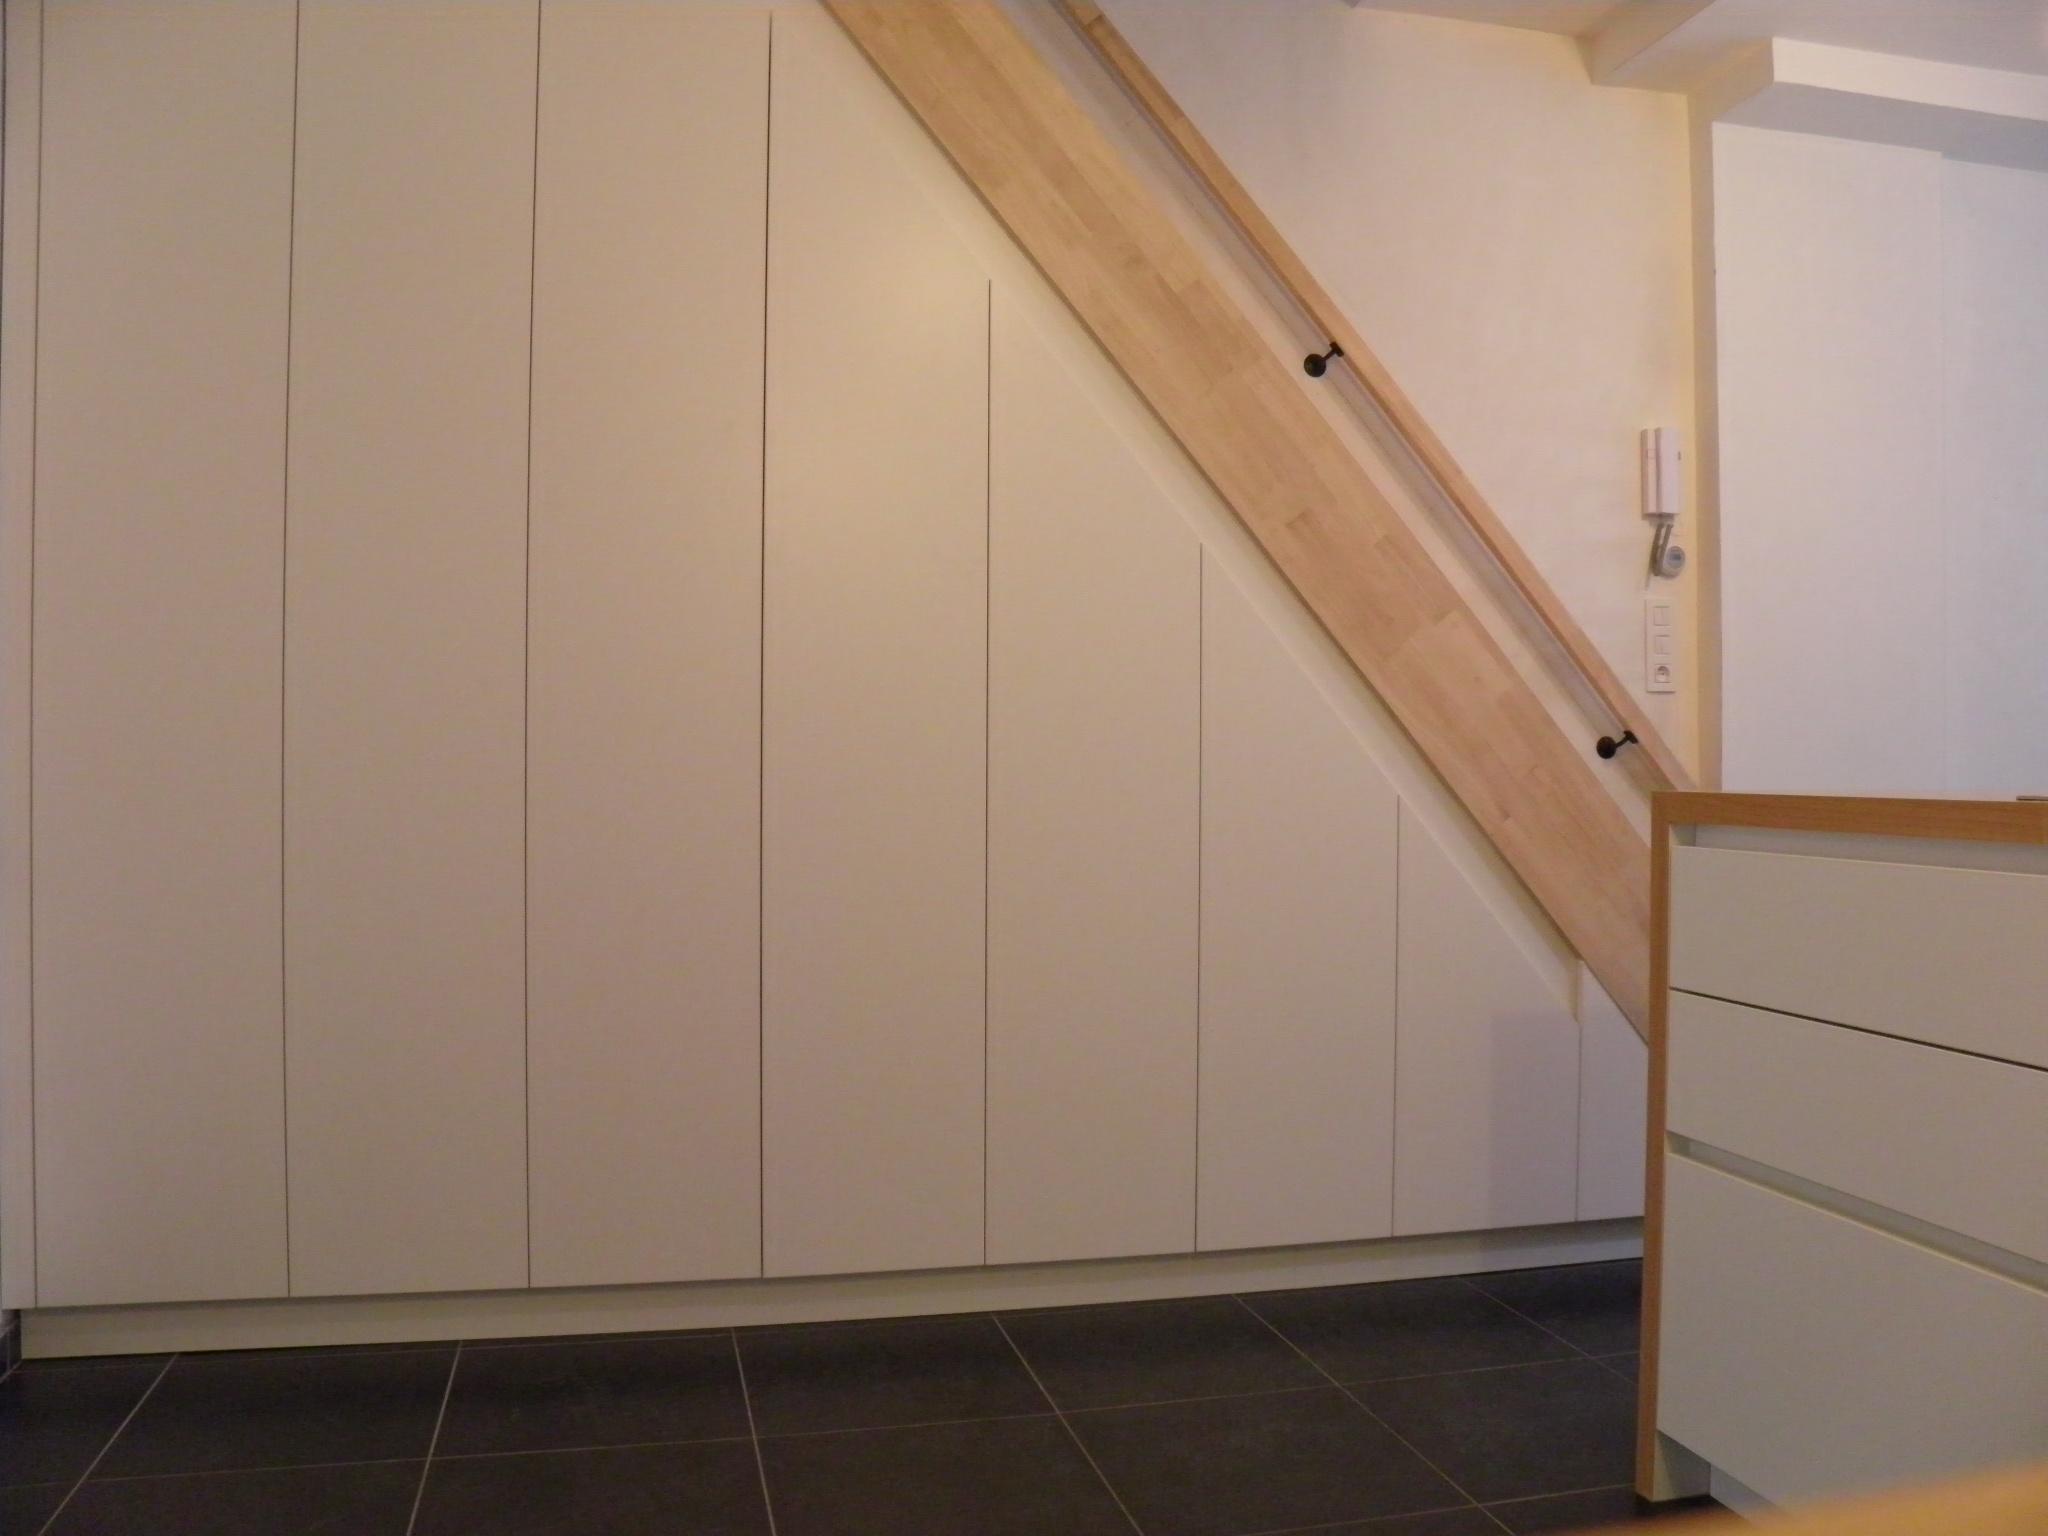 Favoriete Trapkast Maken | Een Kijkje In Onze Trapkast Homelab Interieurstyling #ZX61